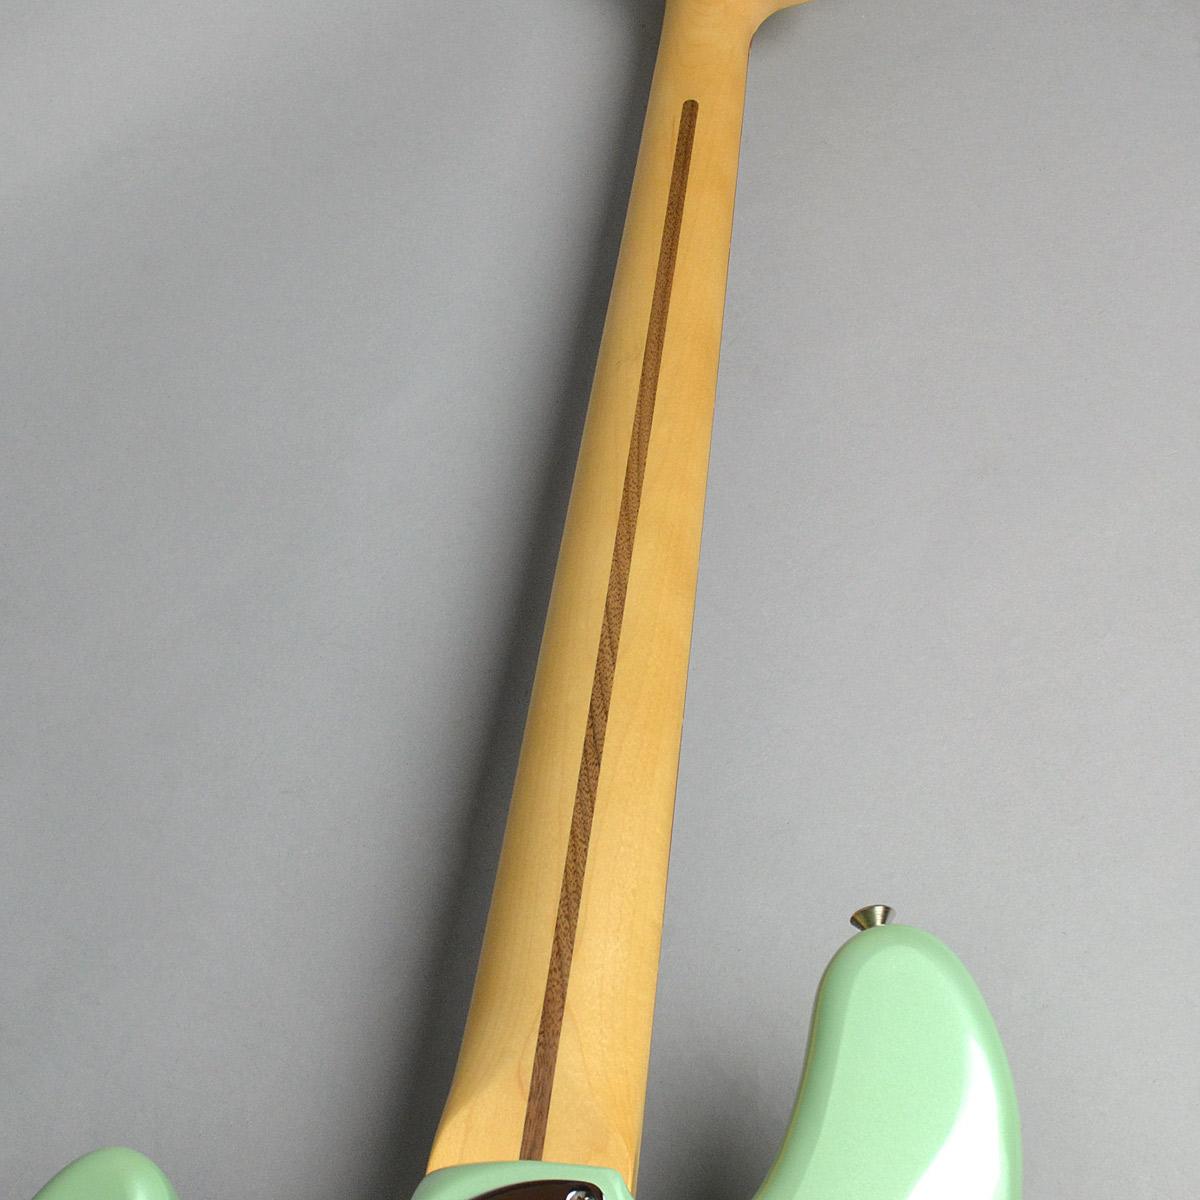 Deluxe Active Jazz Bassのケース・その他画像